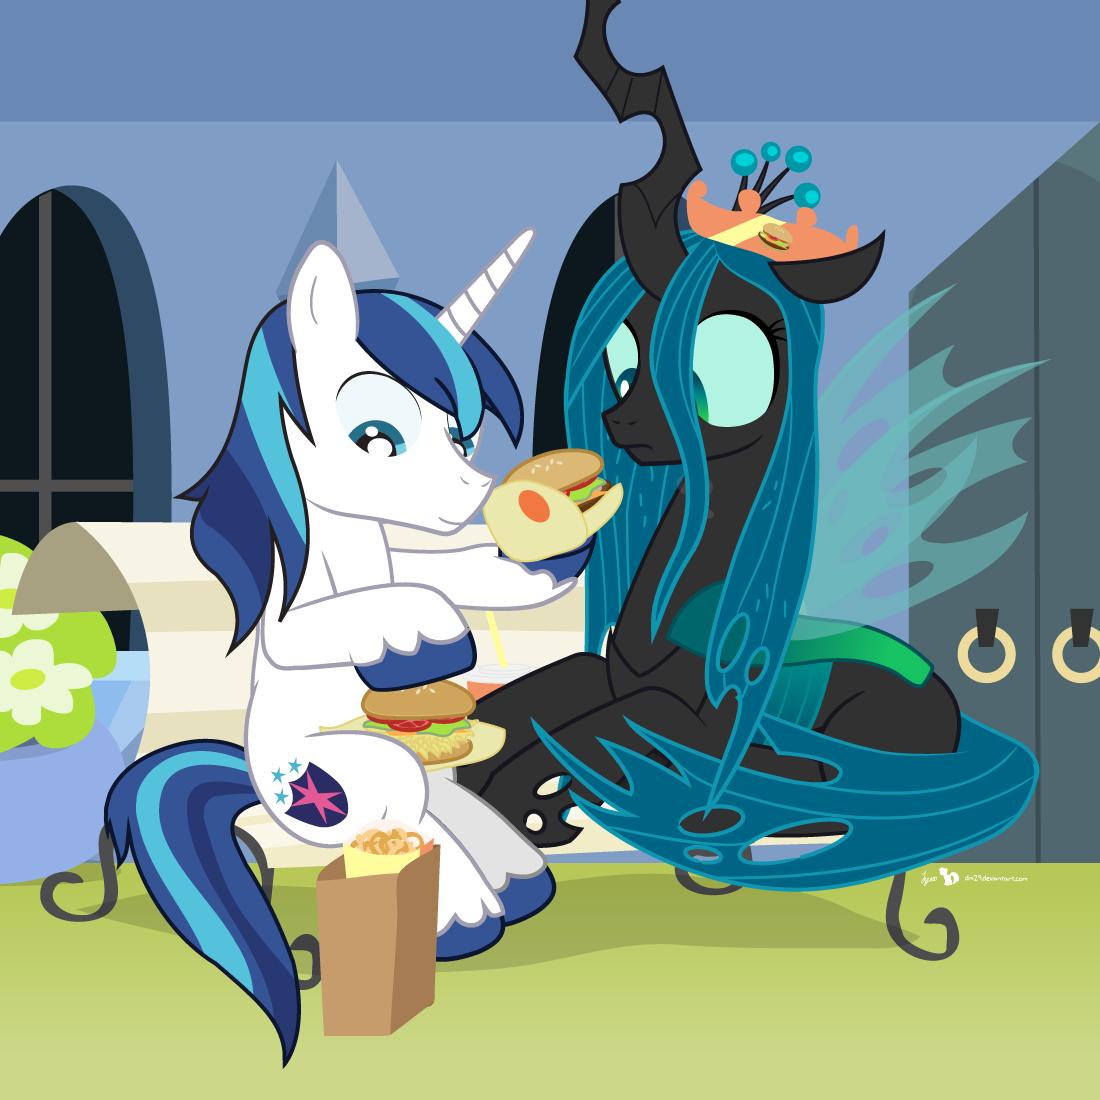 Sitting derpibooru my little pony friendship is magic imageboard